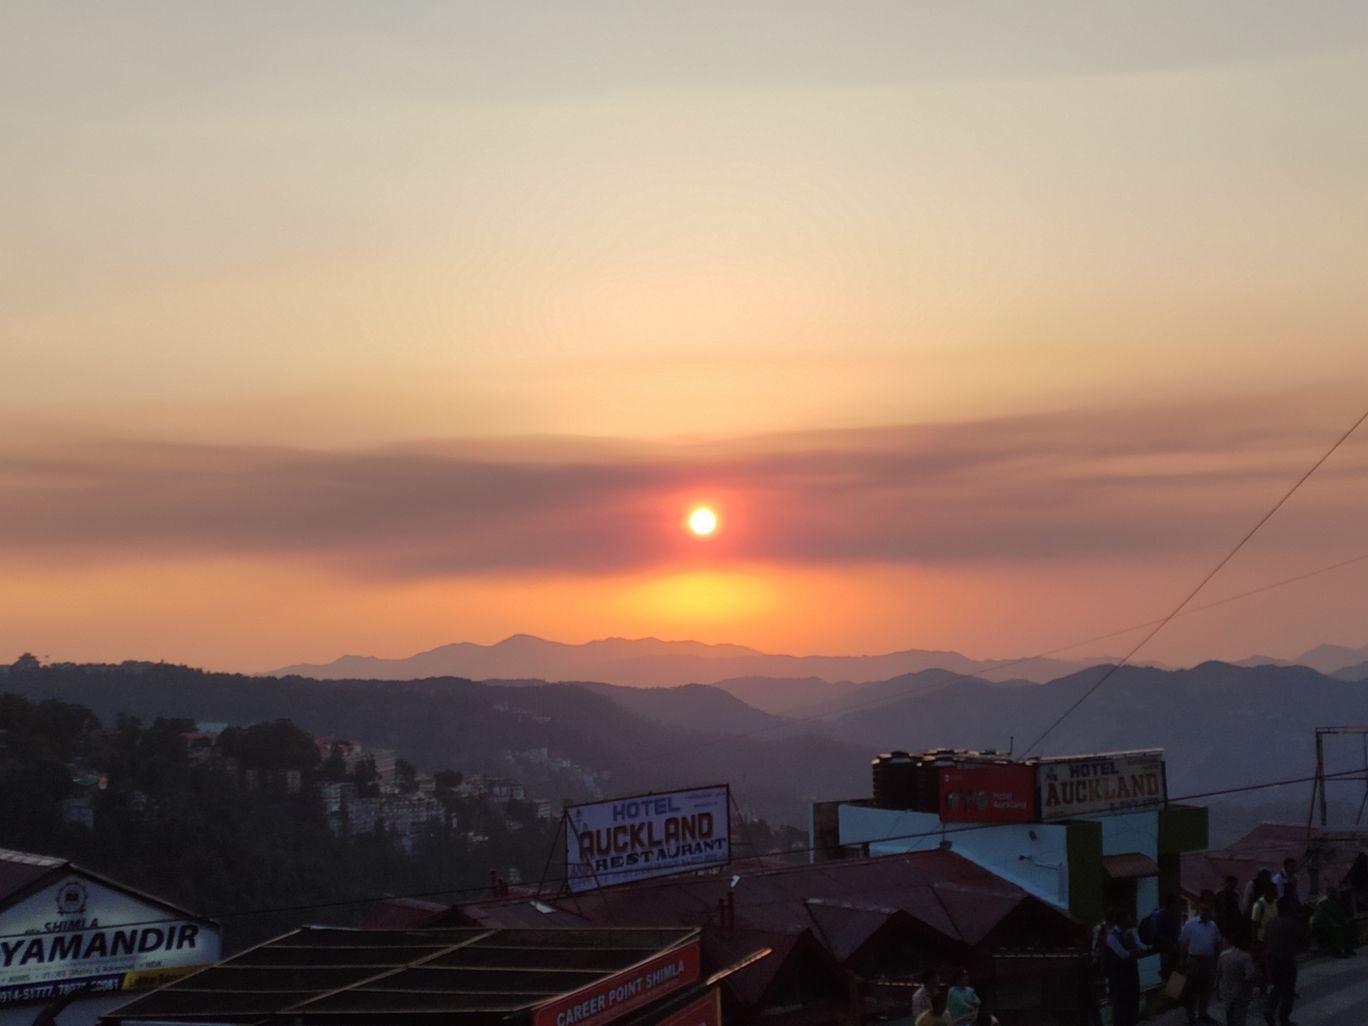 Photo of Himachal Pradesh By Ashish patro